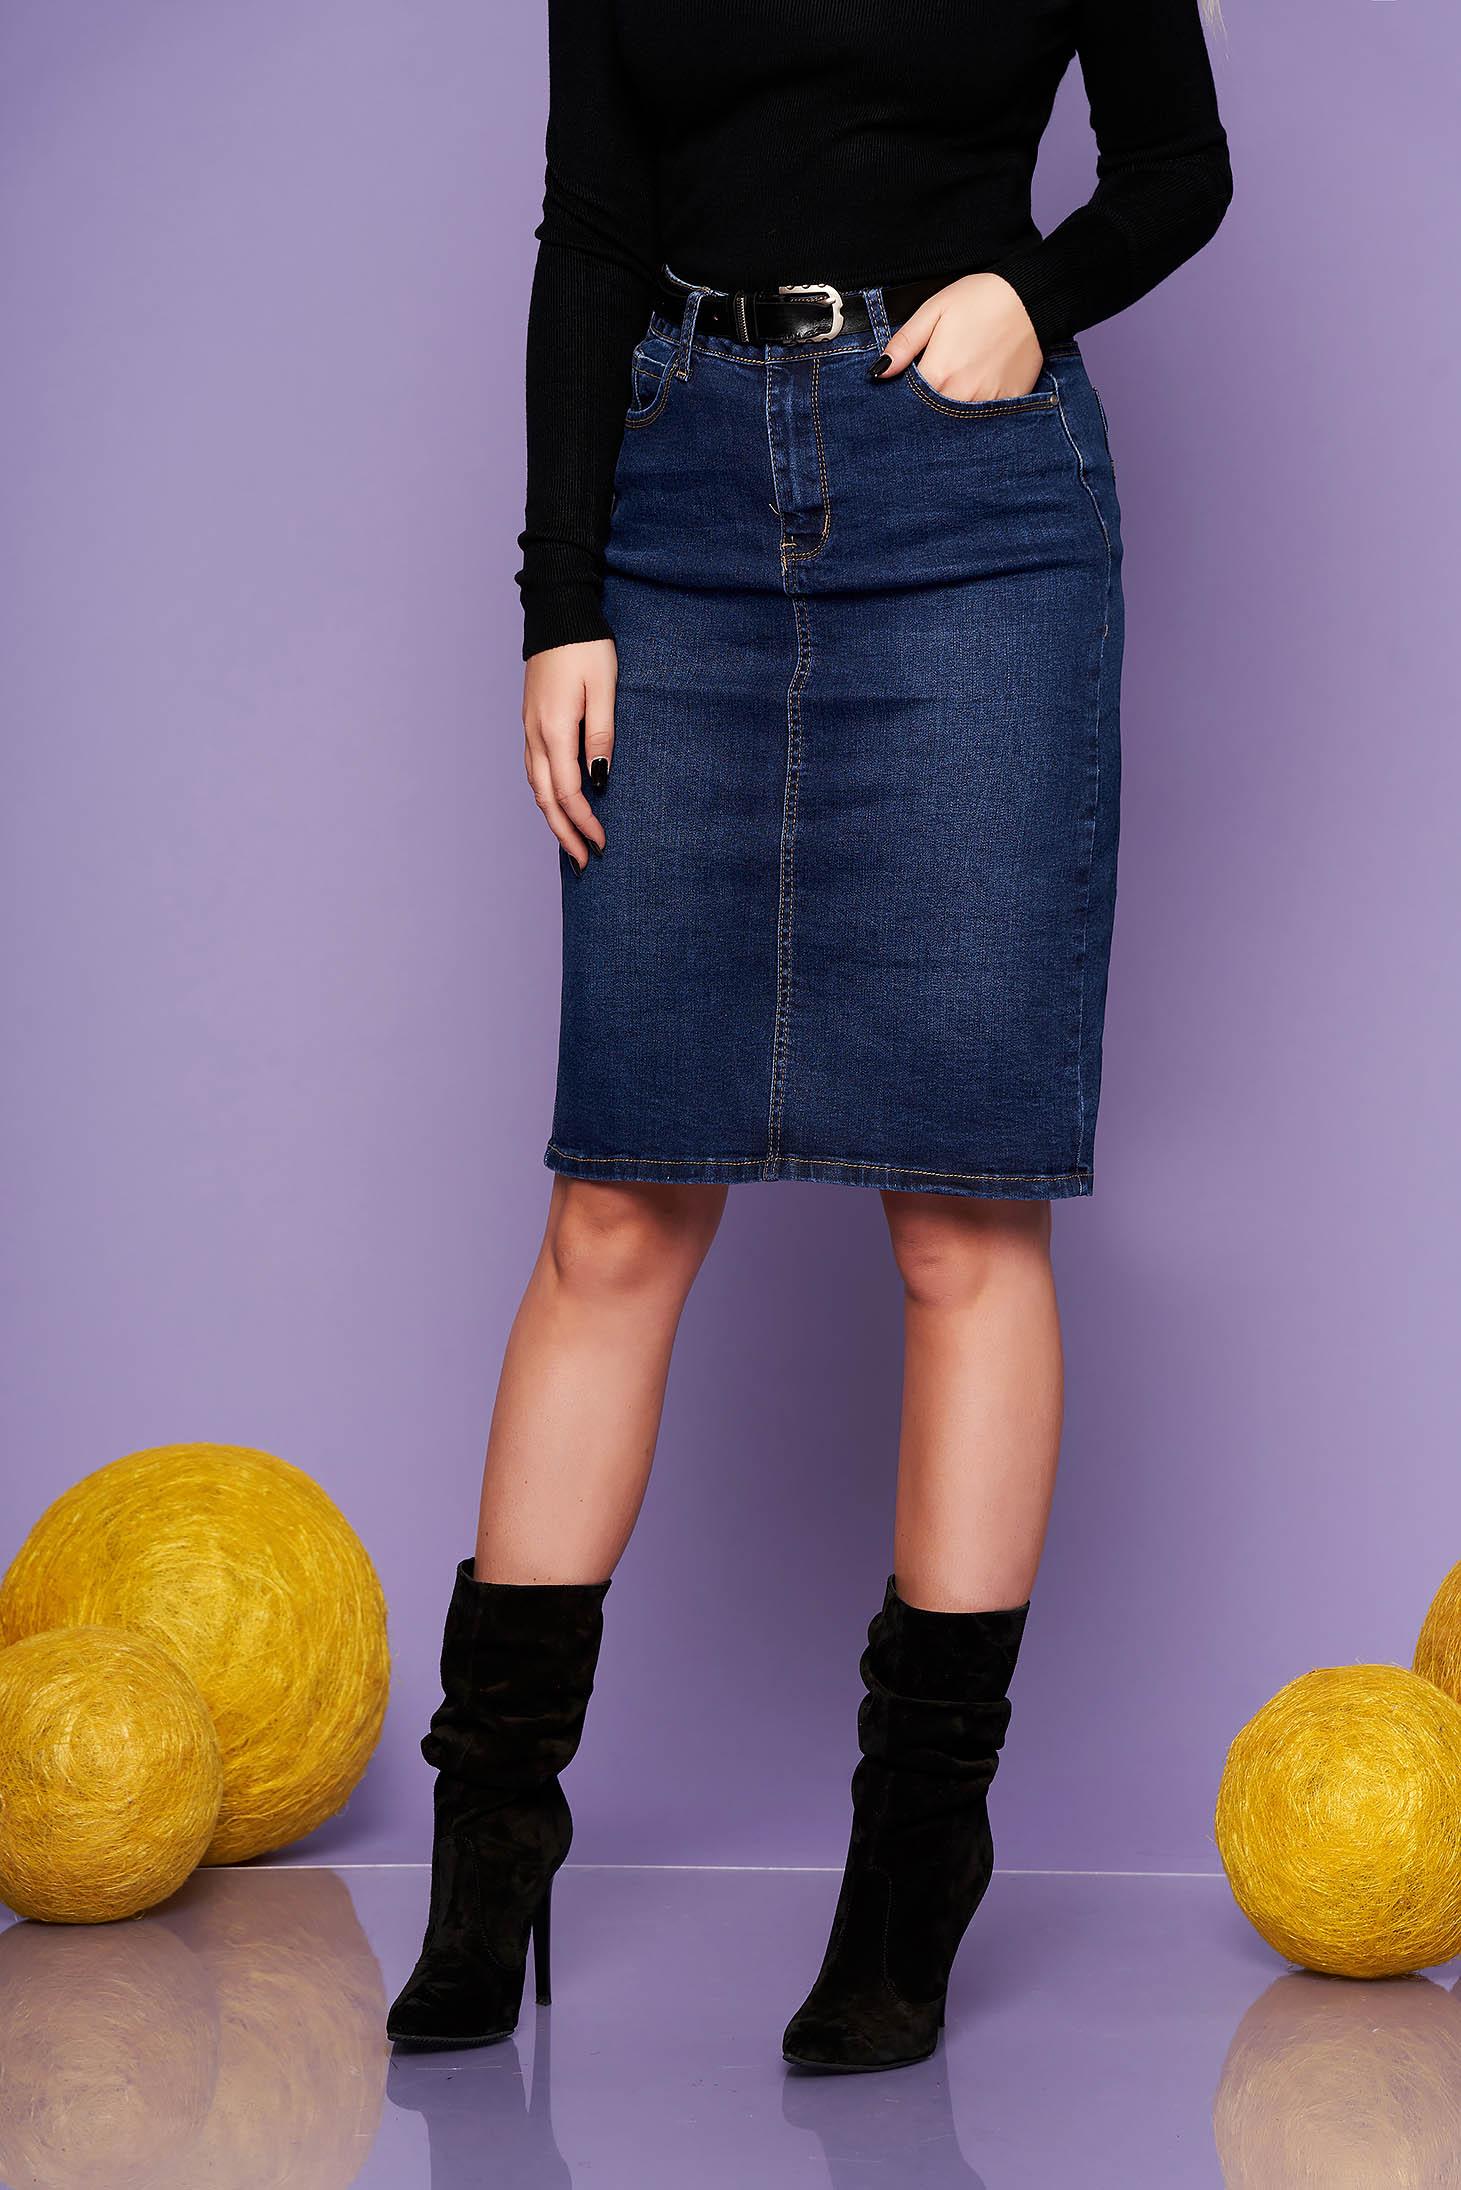 Darkblue midi denim skirt medium waist with tented cut accessorized with belt